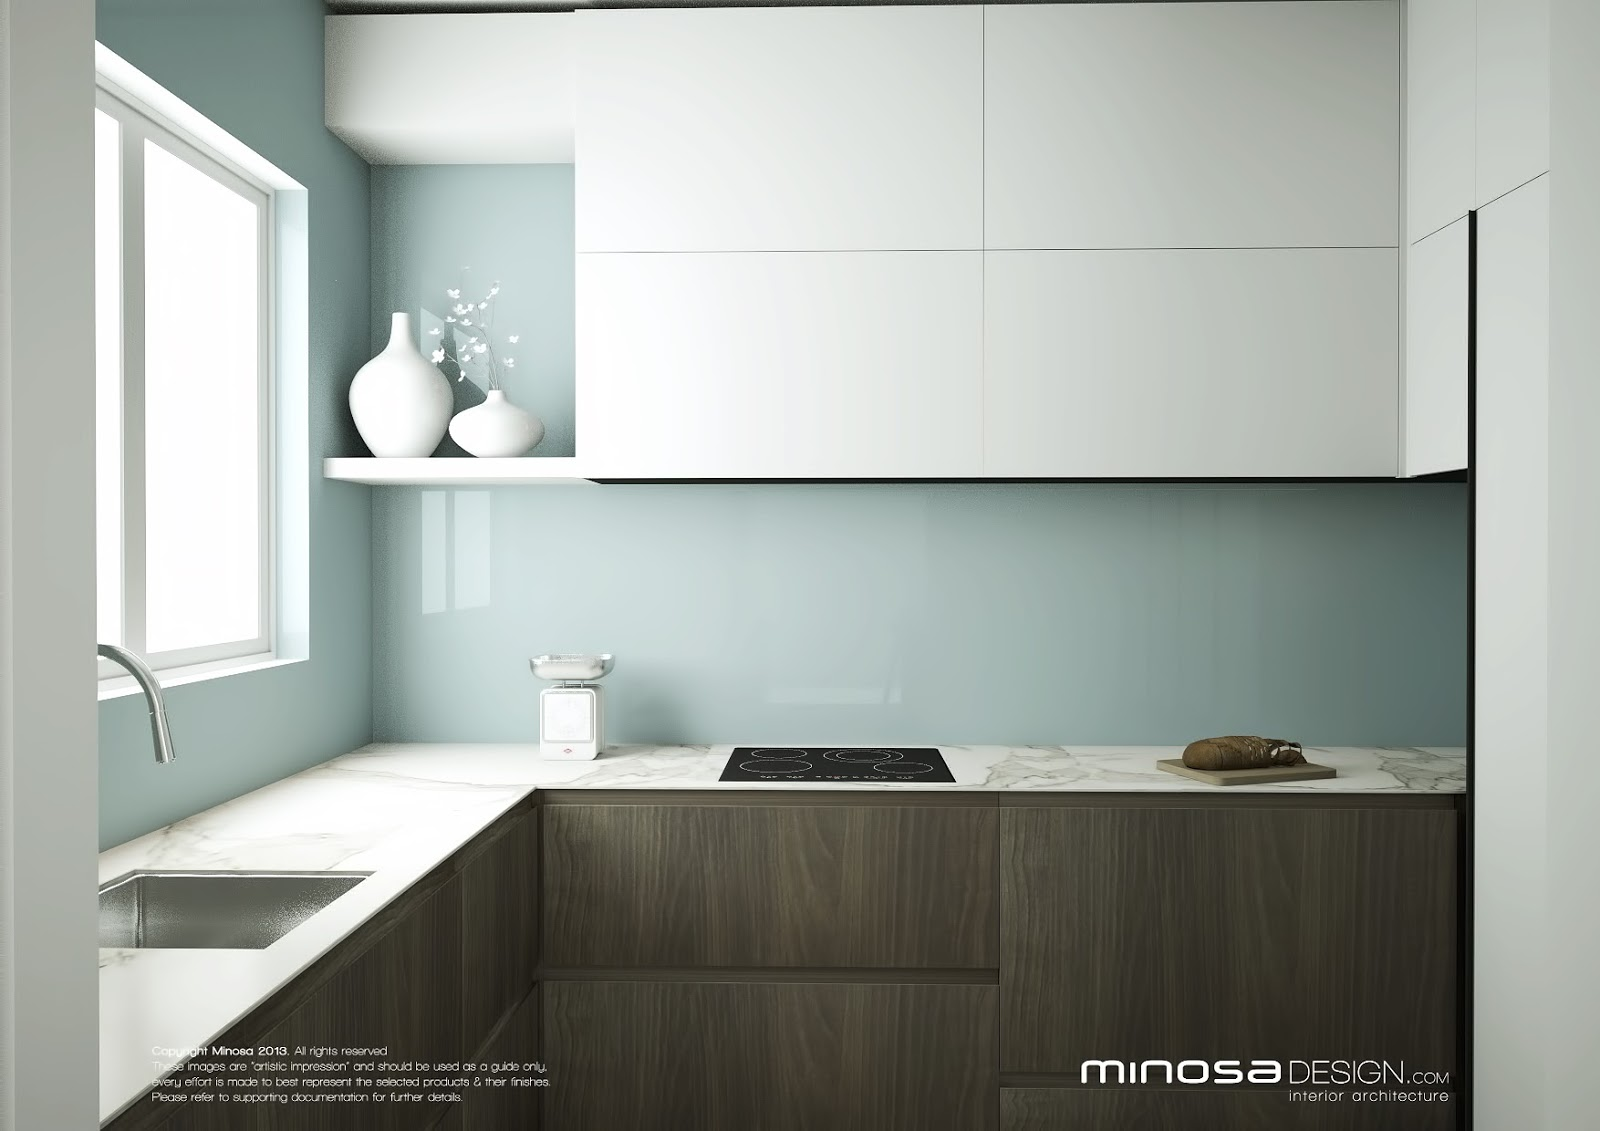 Minosa: Kitchen Design - Connecting Family